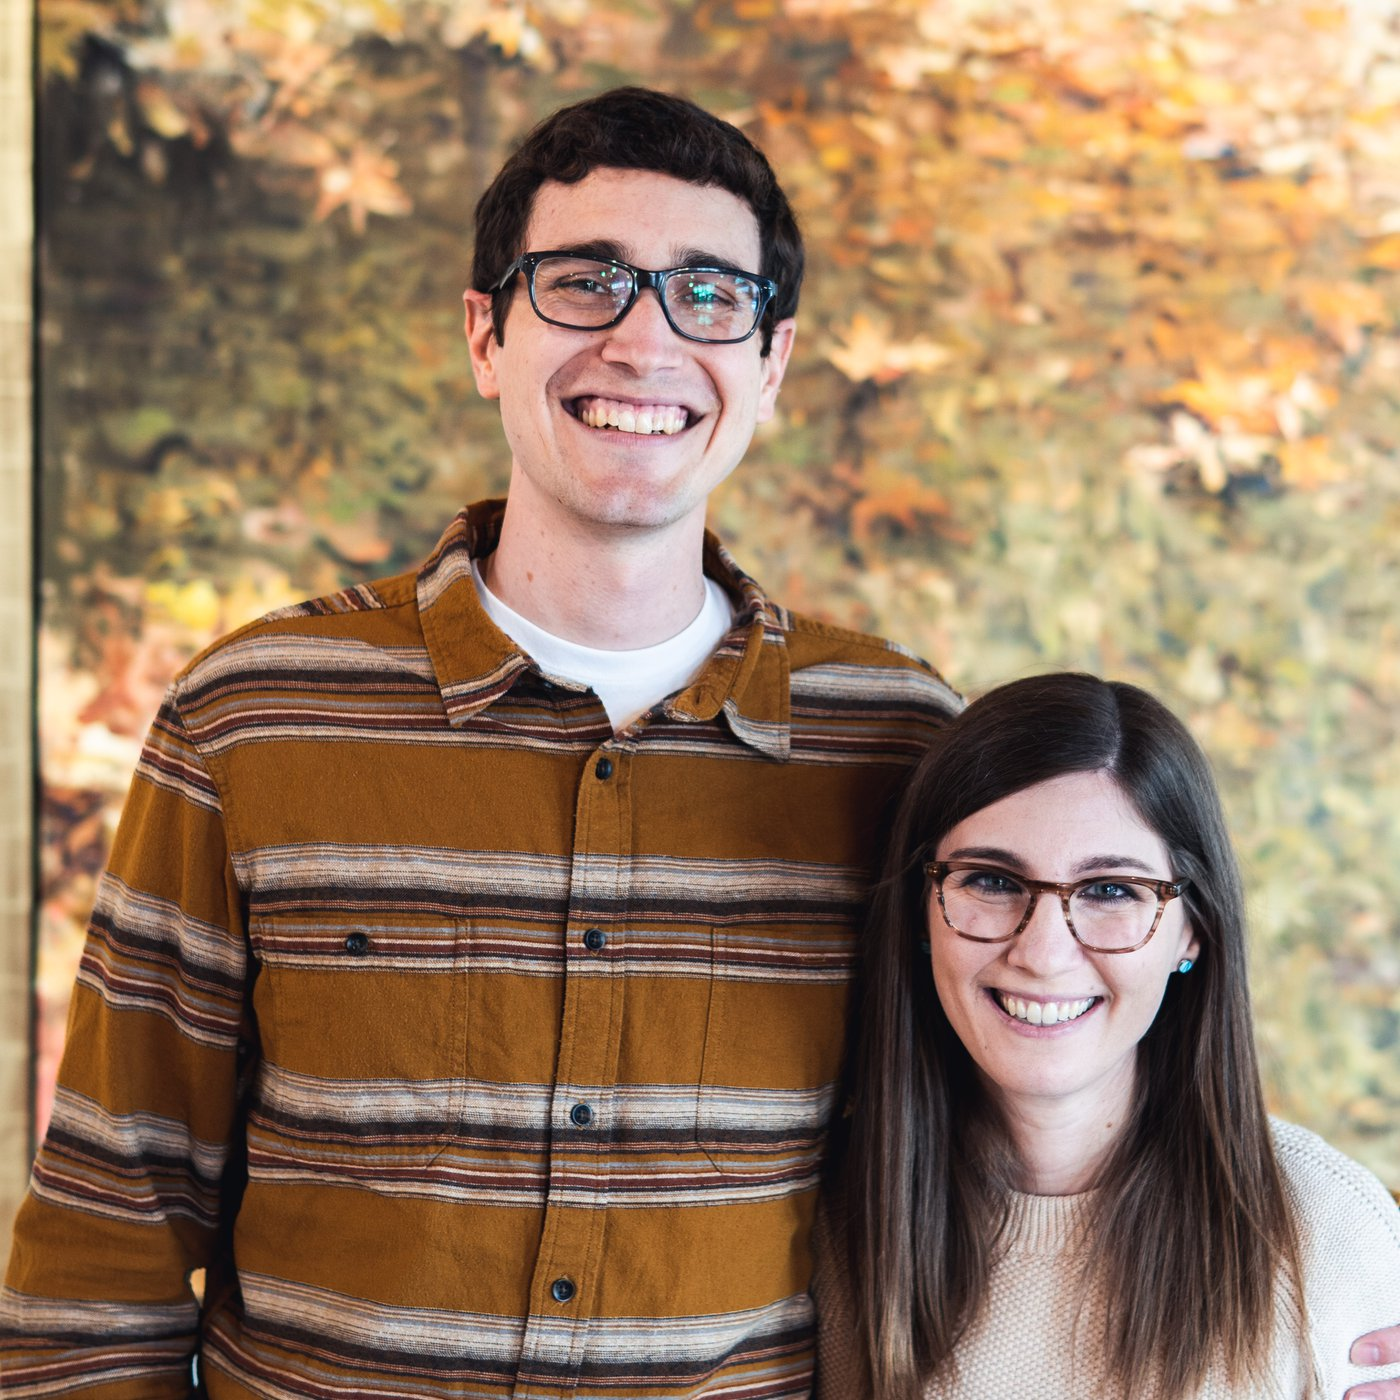 Cole and Anna Baldock